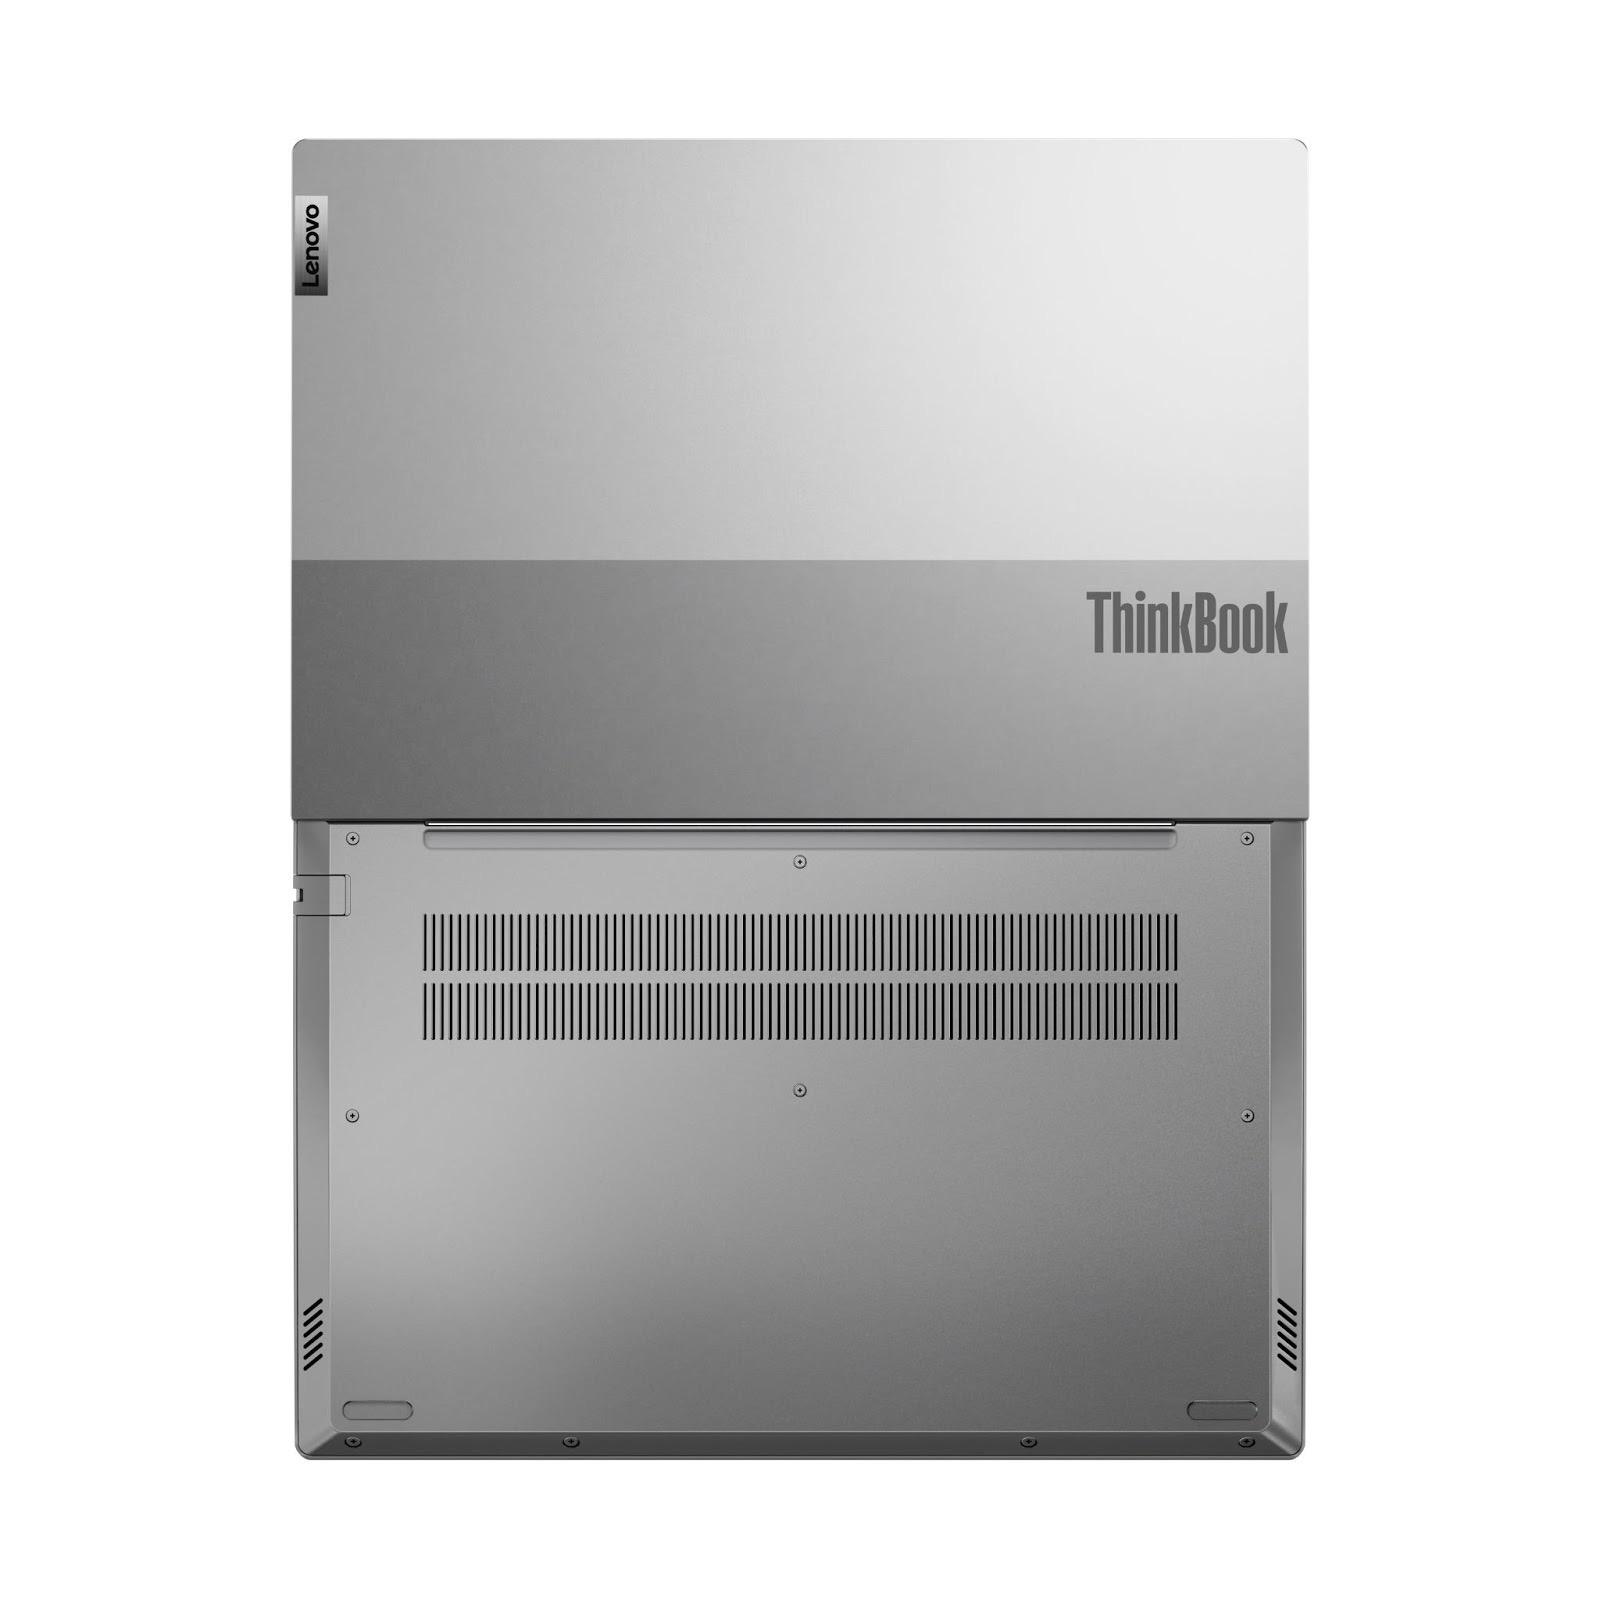 Фото 4. Ноутбук Lenovo ThinkBook 14 Gen 2 ITL Mineral Grey (20VD0043RU)